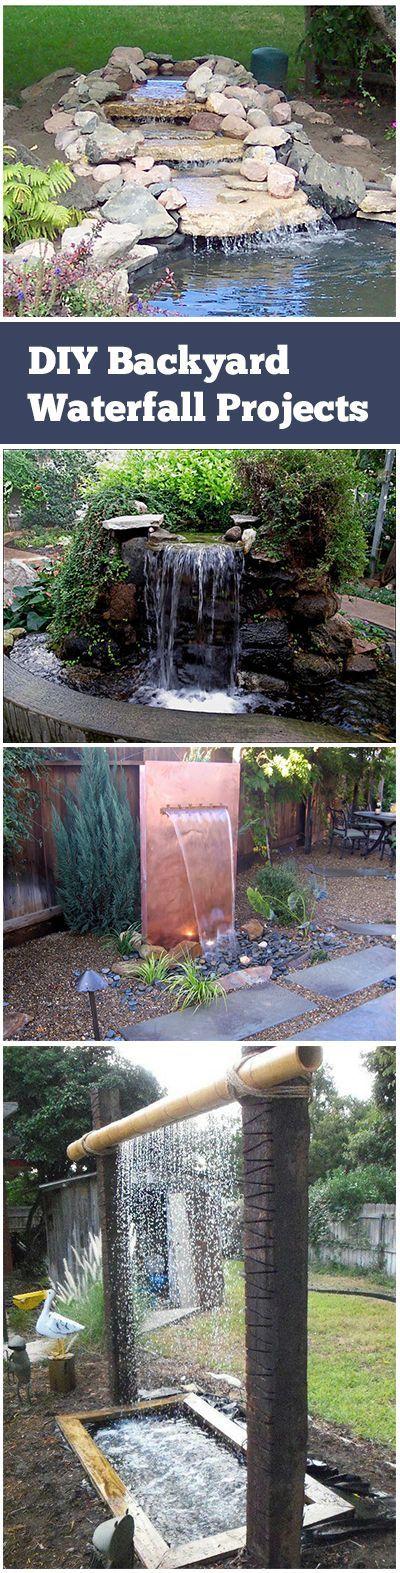 DIY Backyard Waterfall Projects